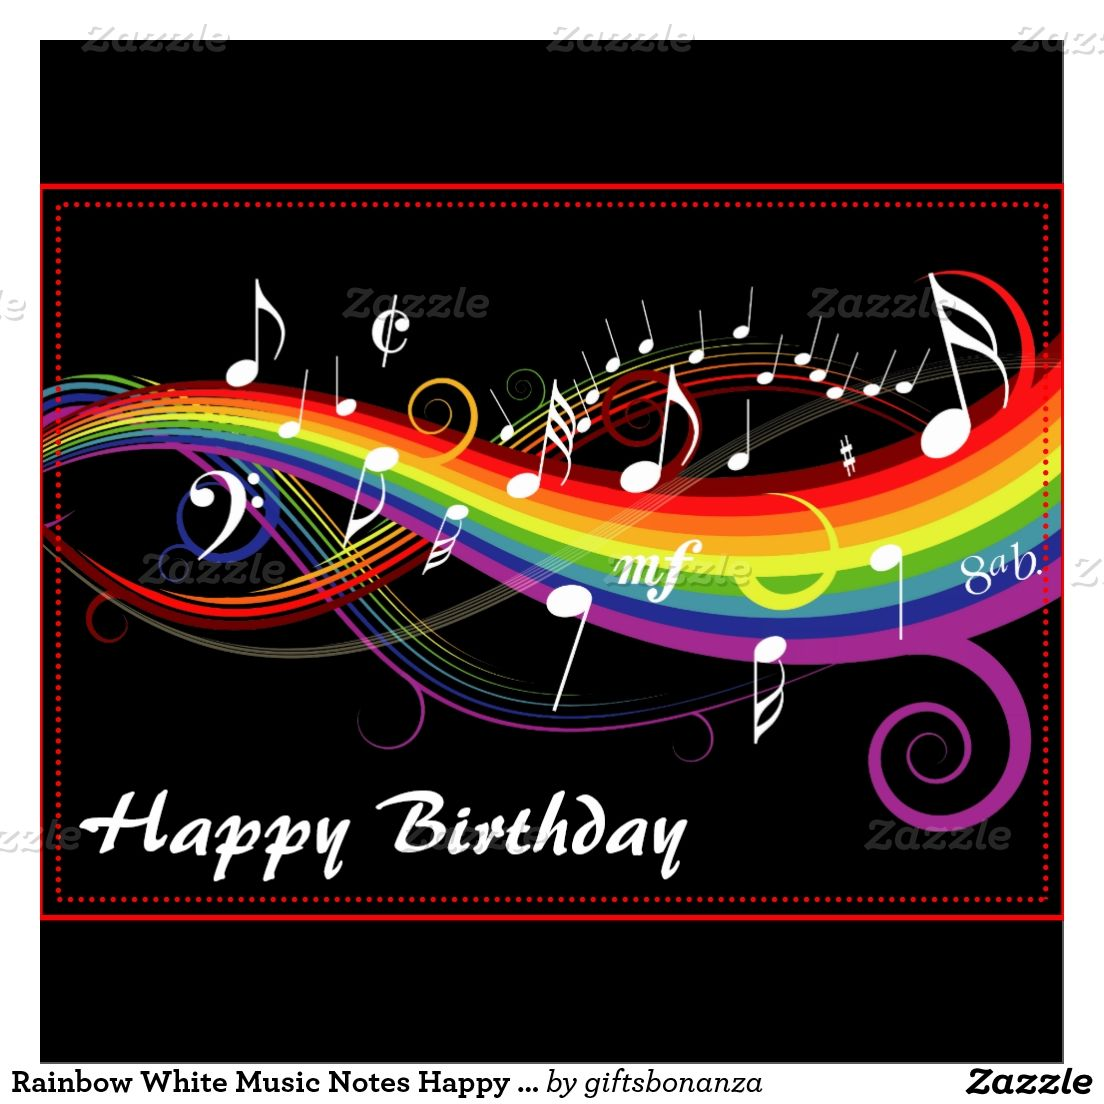 Rainbow White Music Notes Happy Birthday Card Zazzle Com Rainbow Music Music Images Music Notes